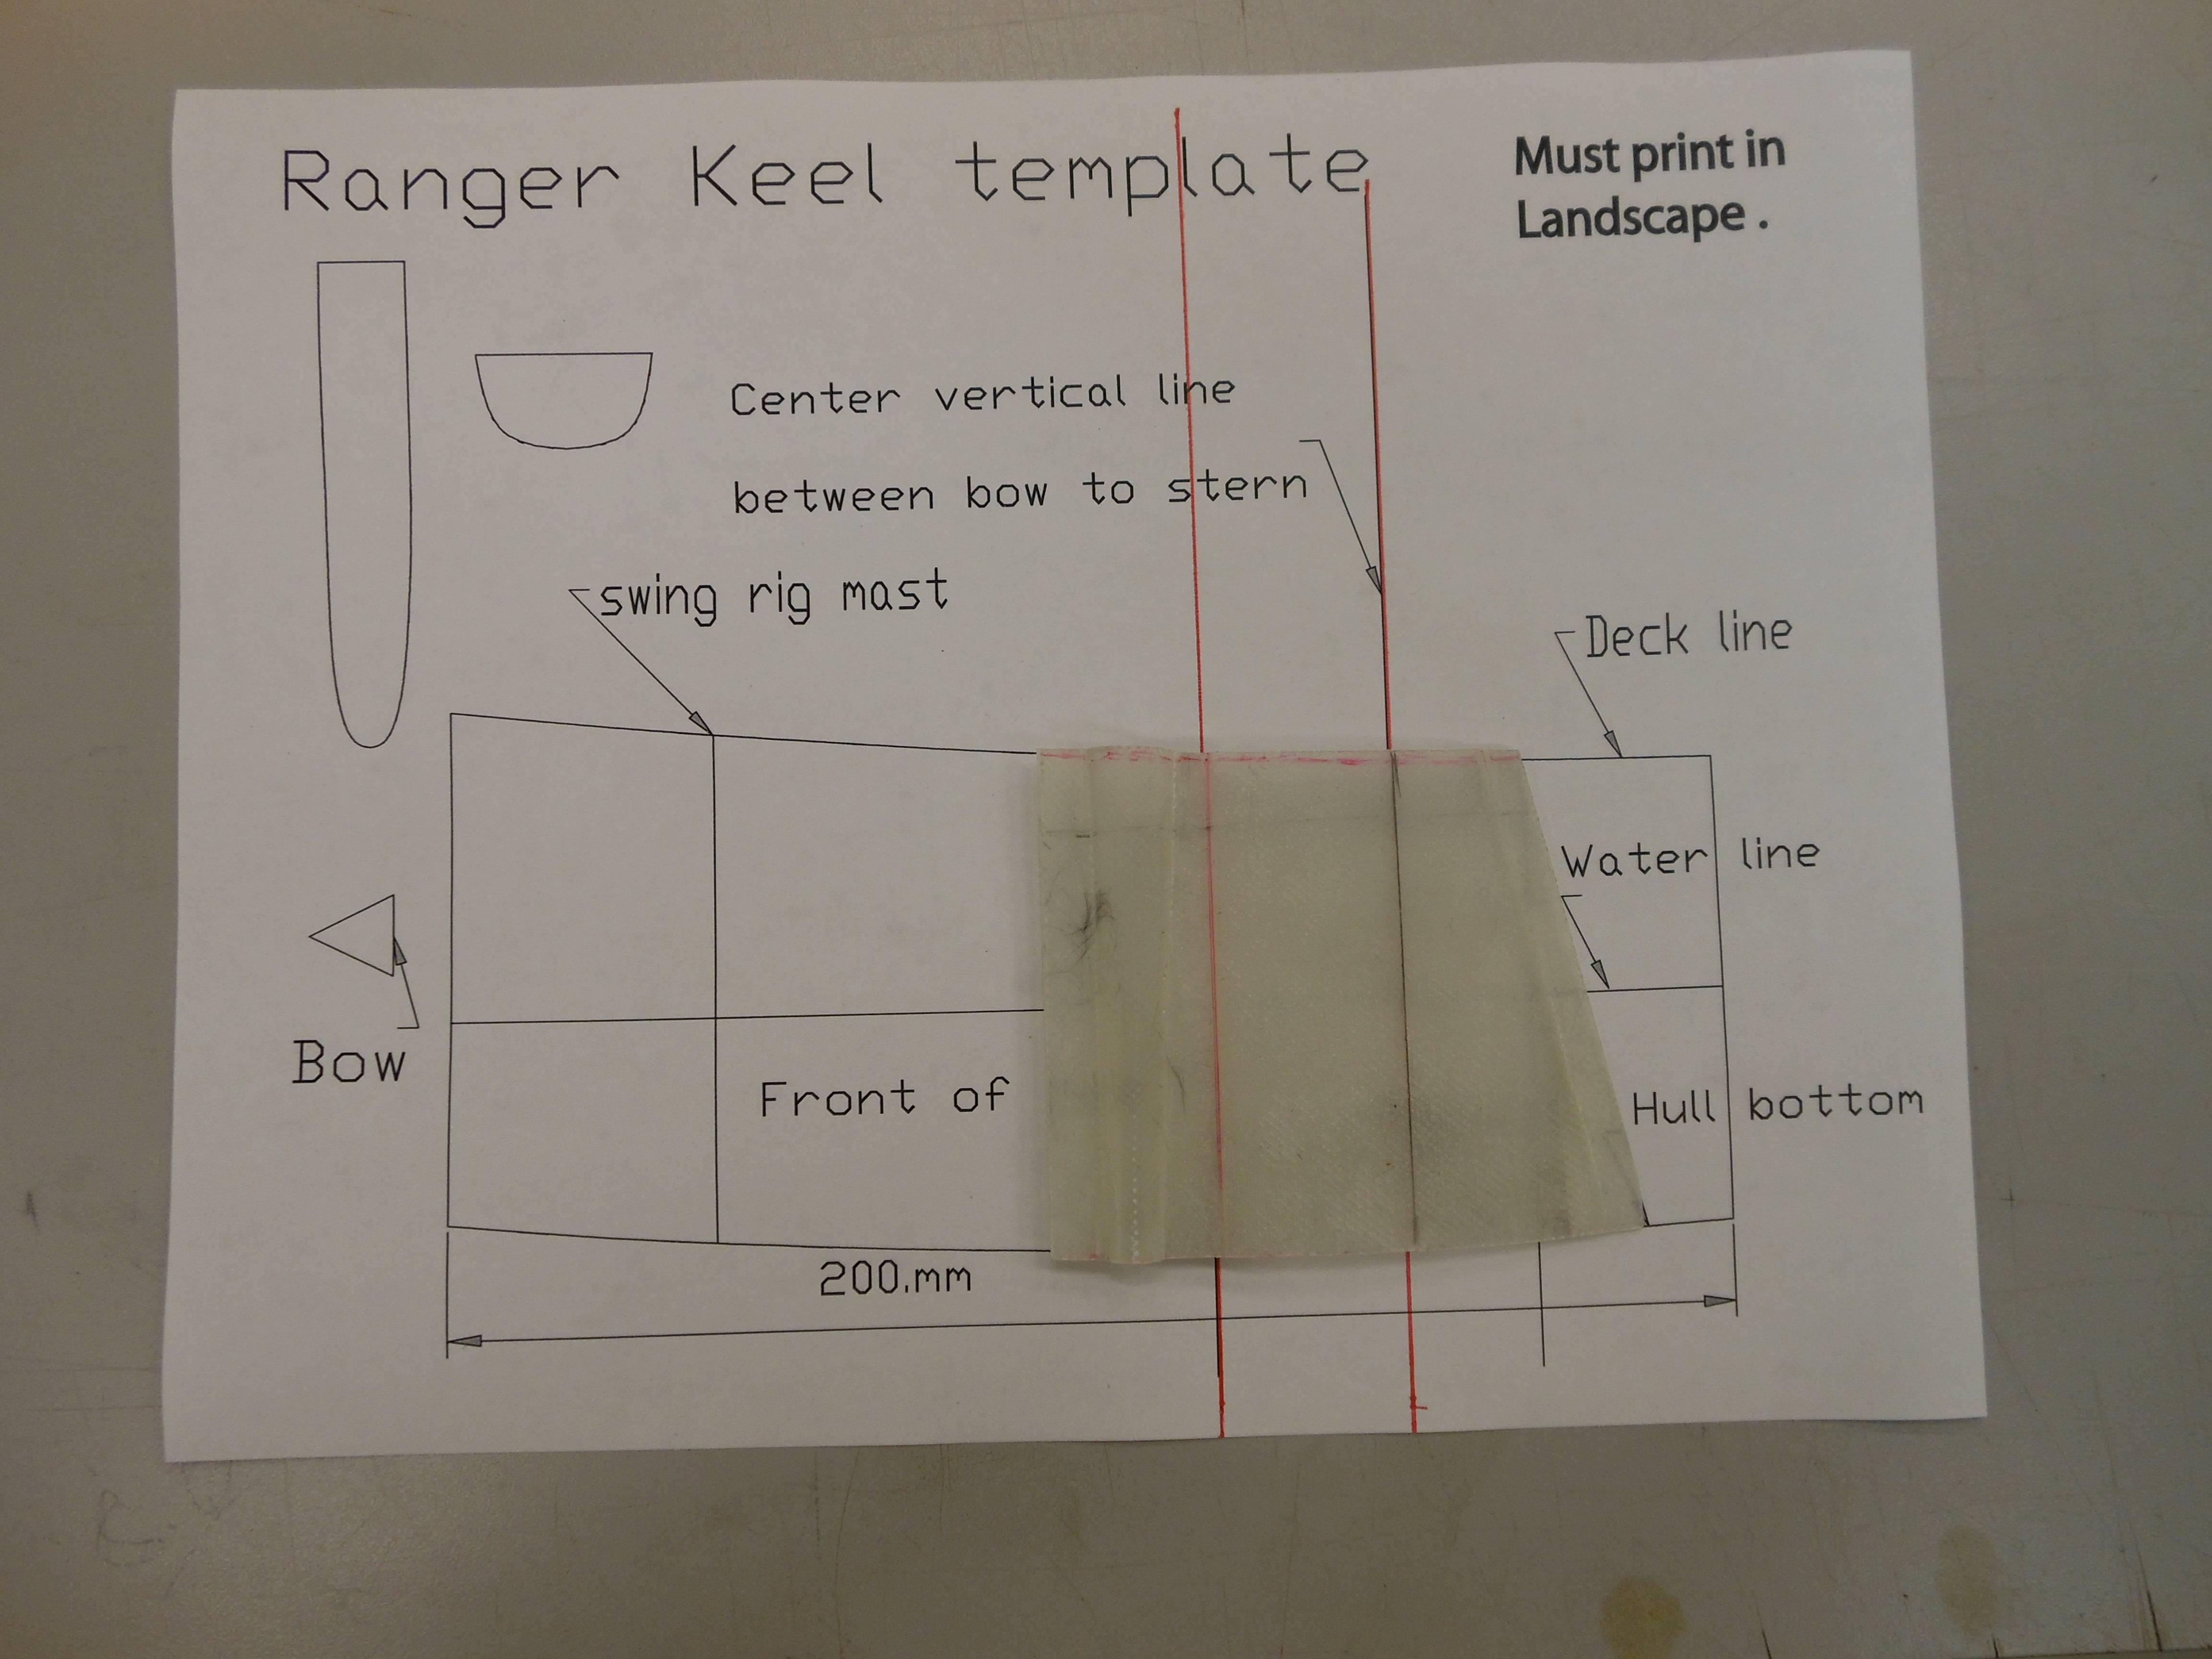 Ranger keel cut to template